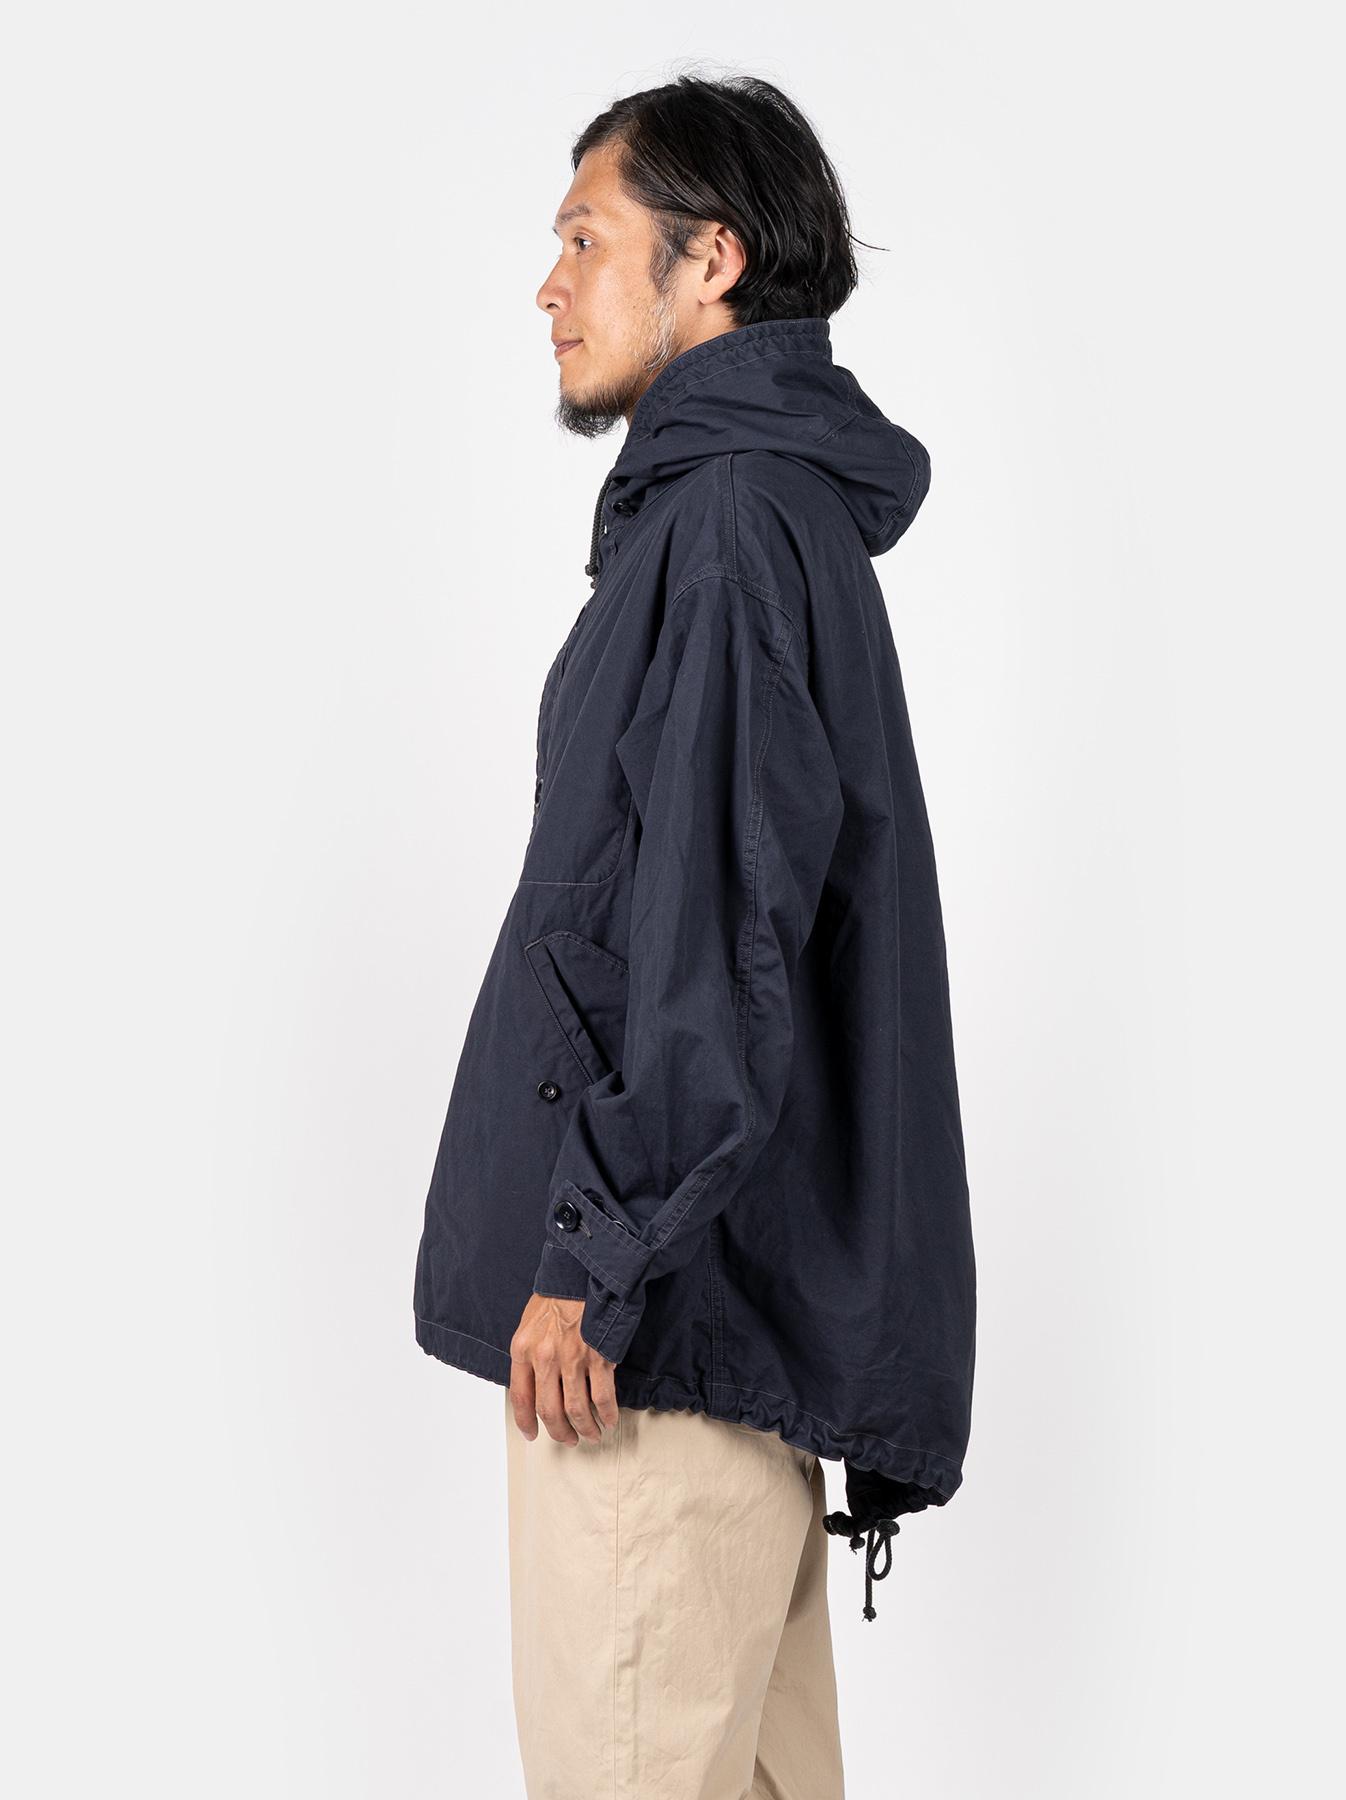 Weather Cloth Umahiko Mods Hoodie-4